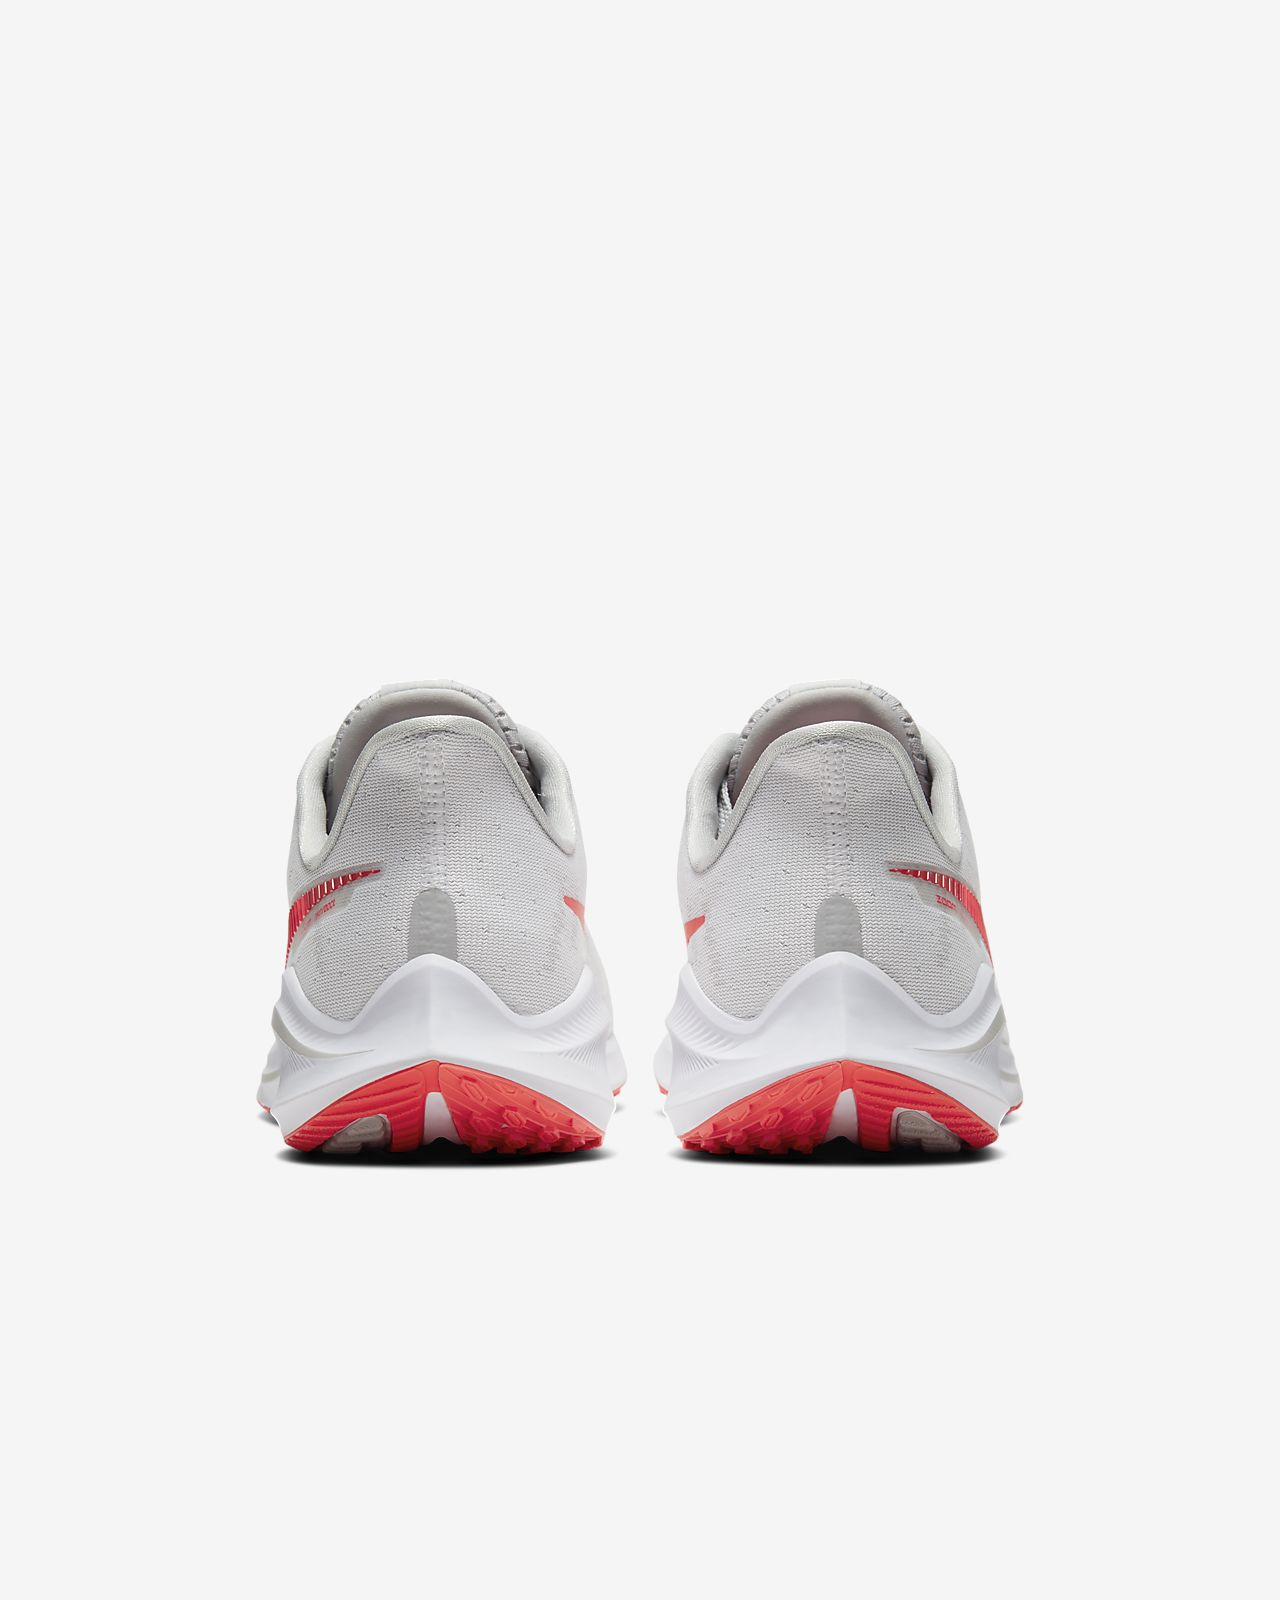 NIKE Futócipők 'Nike Air Zoom Vomero 14' piros fehér